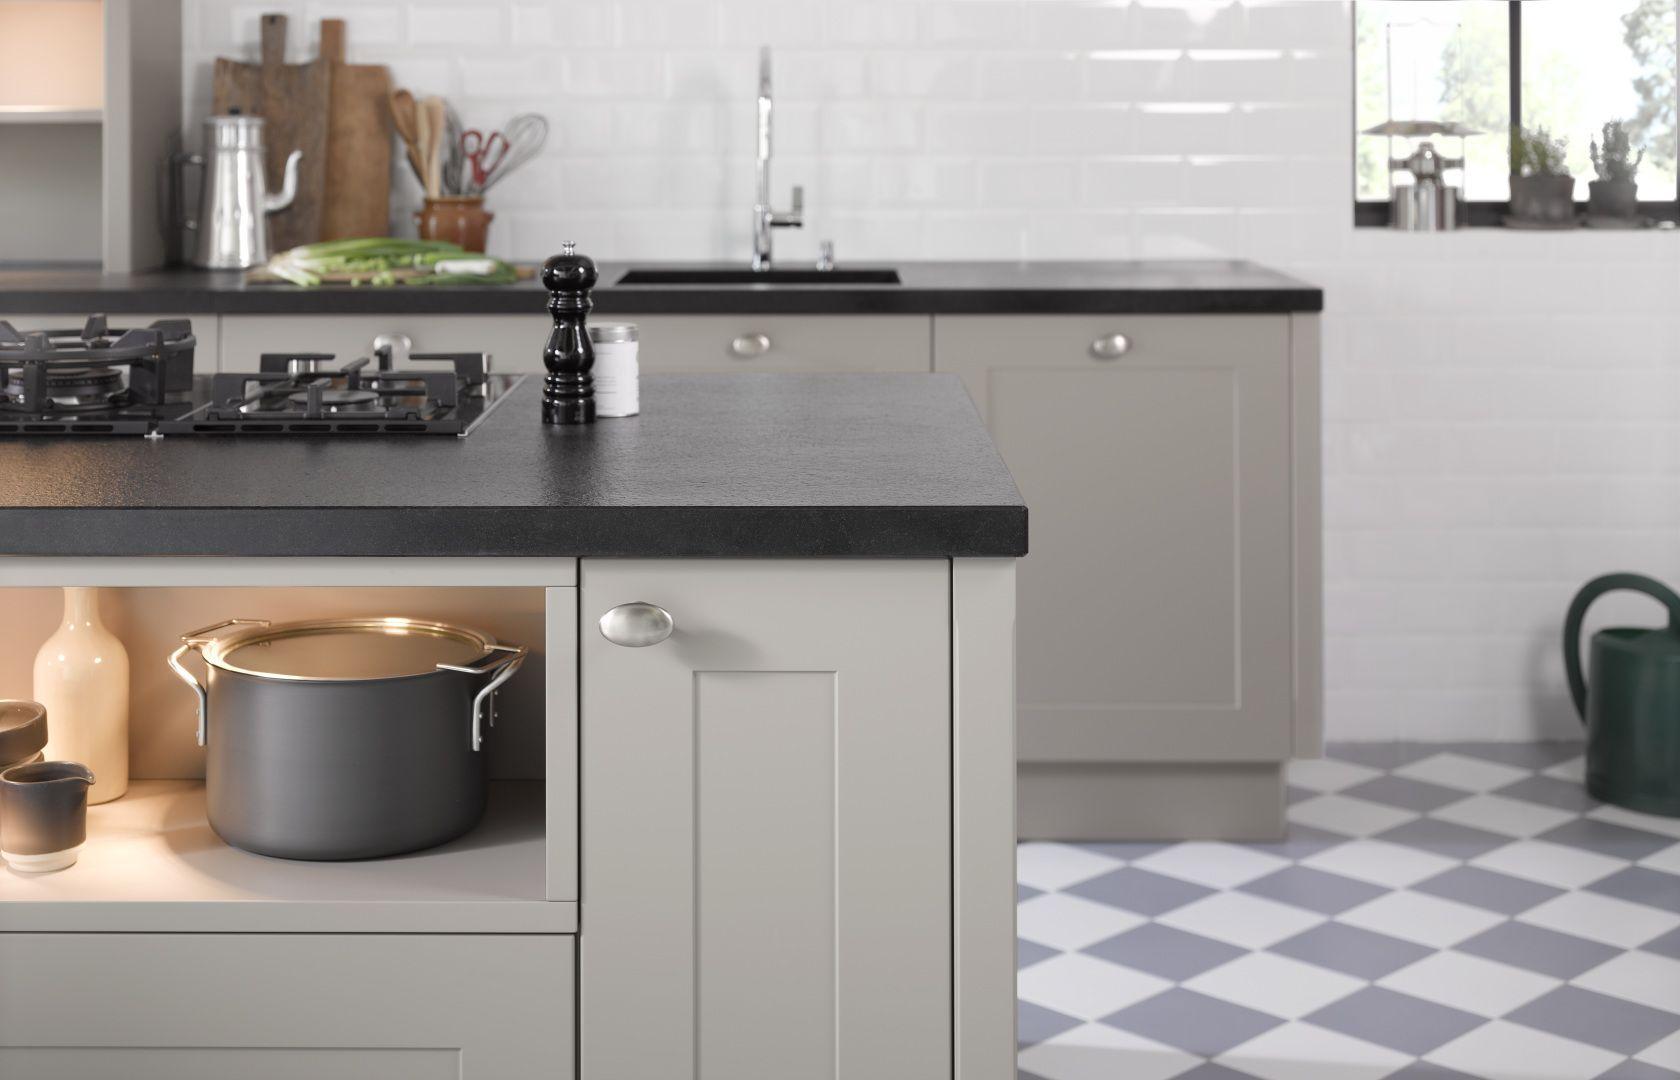 kuchnia nolte w stylu country house landhaus kuchnia. Black Bedroom Furniture Sets. Home Design Ideas